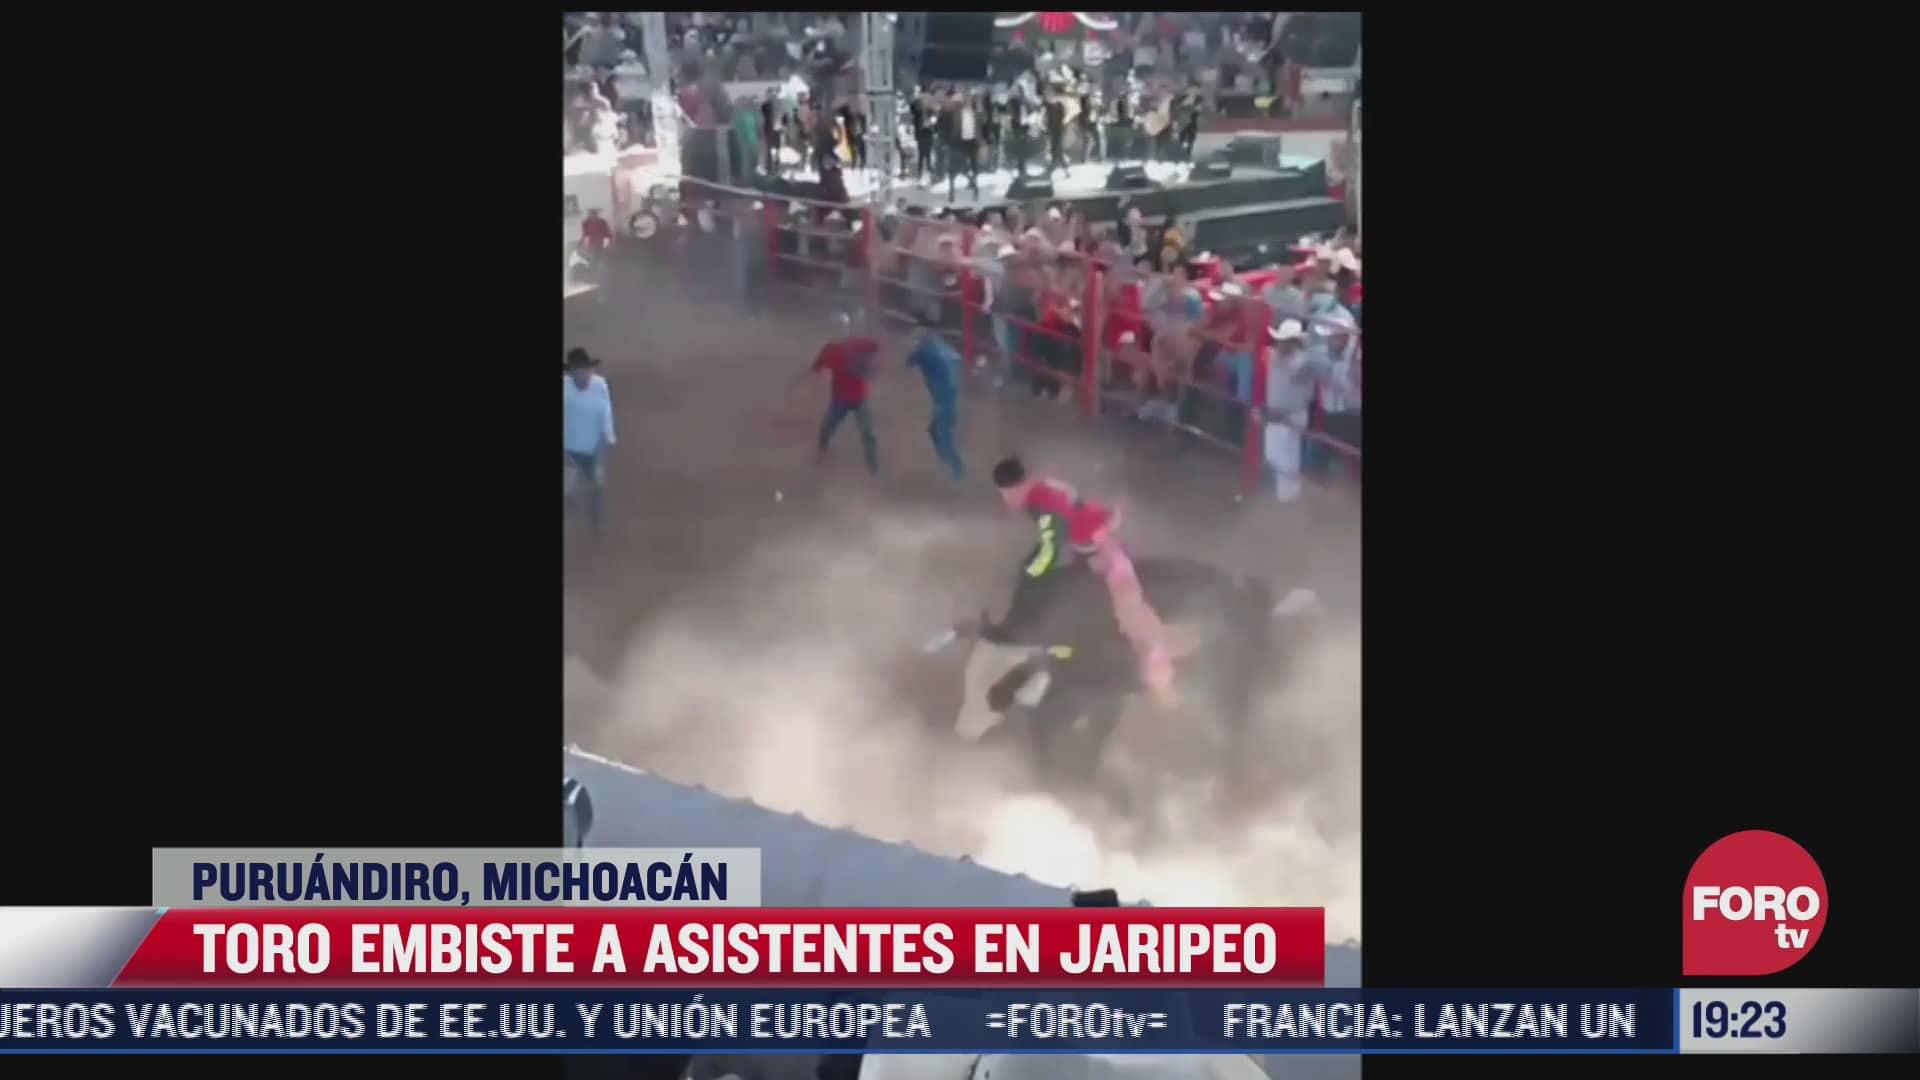 toro embiste a asistentes de jaripeo en michoacan